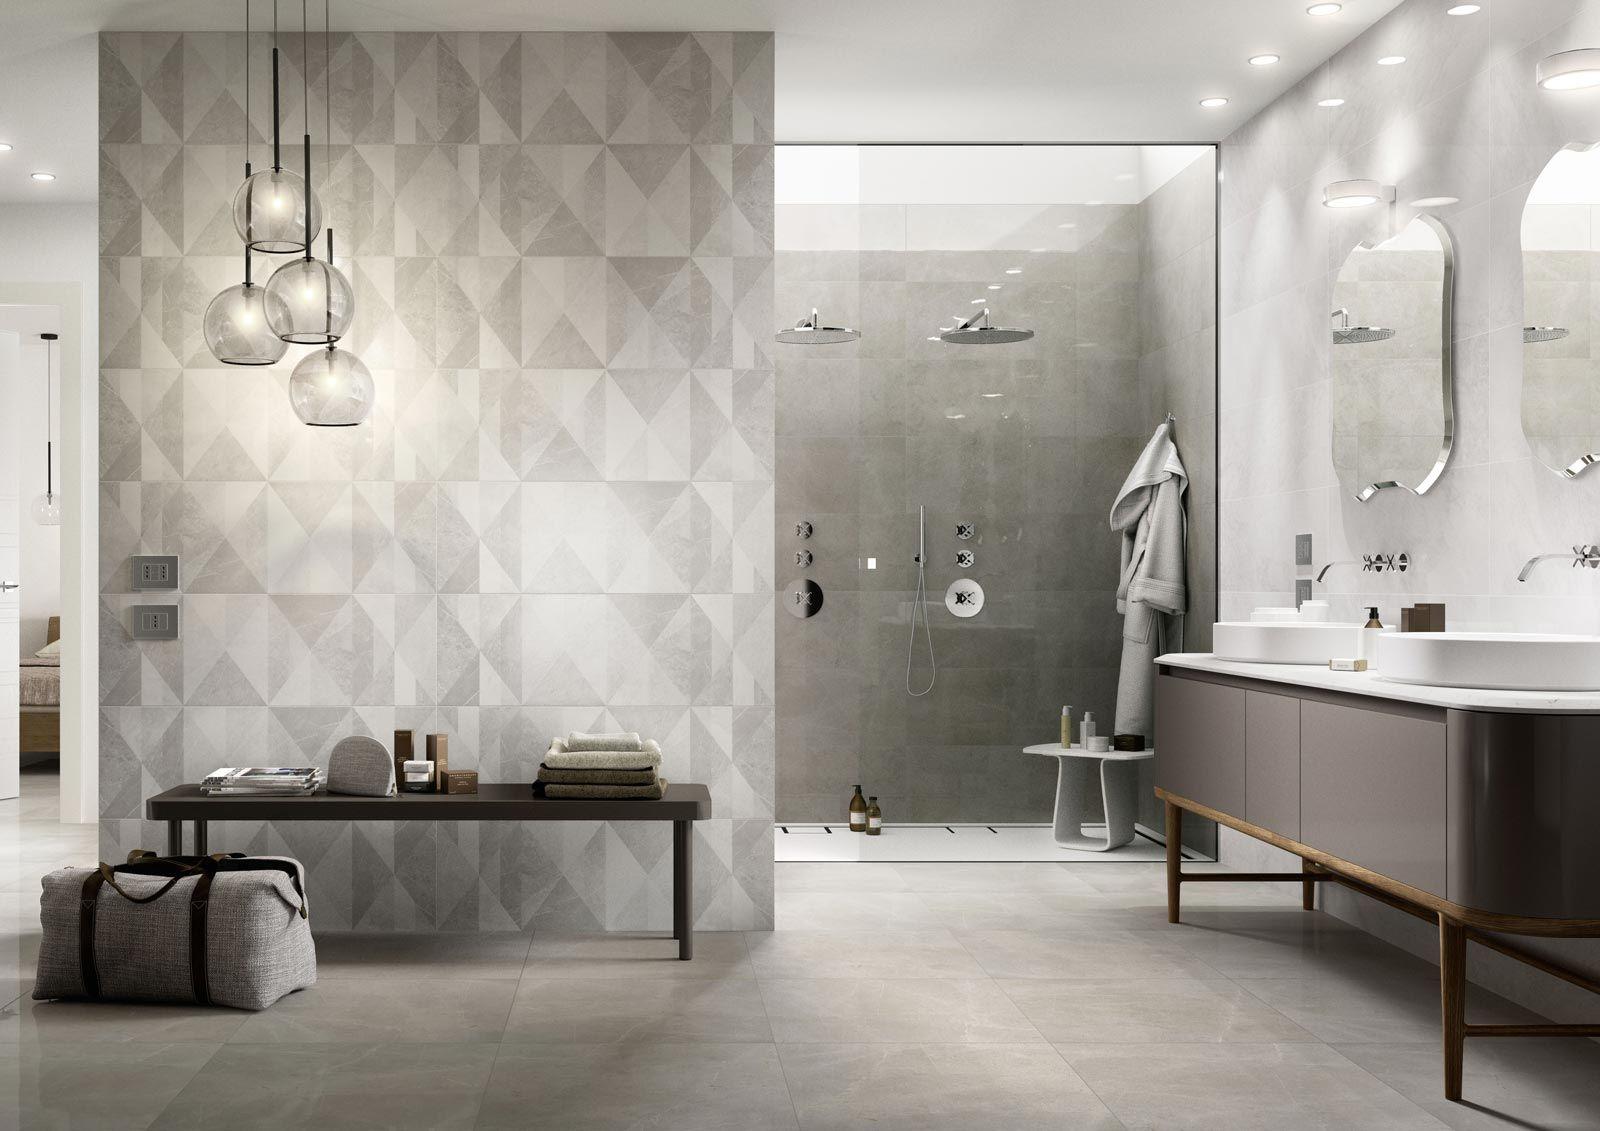 Bathroom Flooring Ceramic And Porcelain Stoneware Bathroom Interior Design Vintage Bathroom Tile Bathroom Design